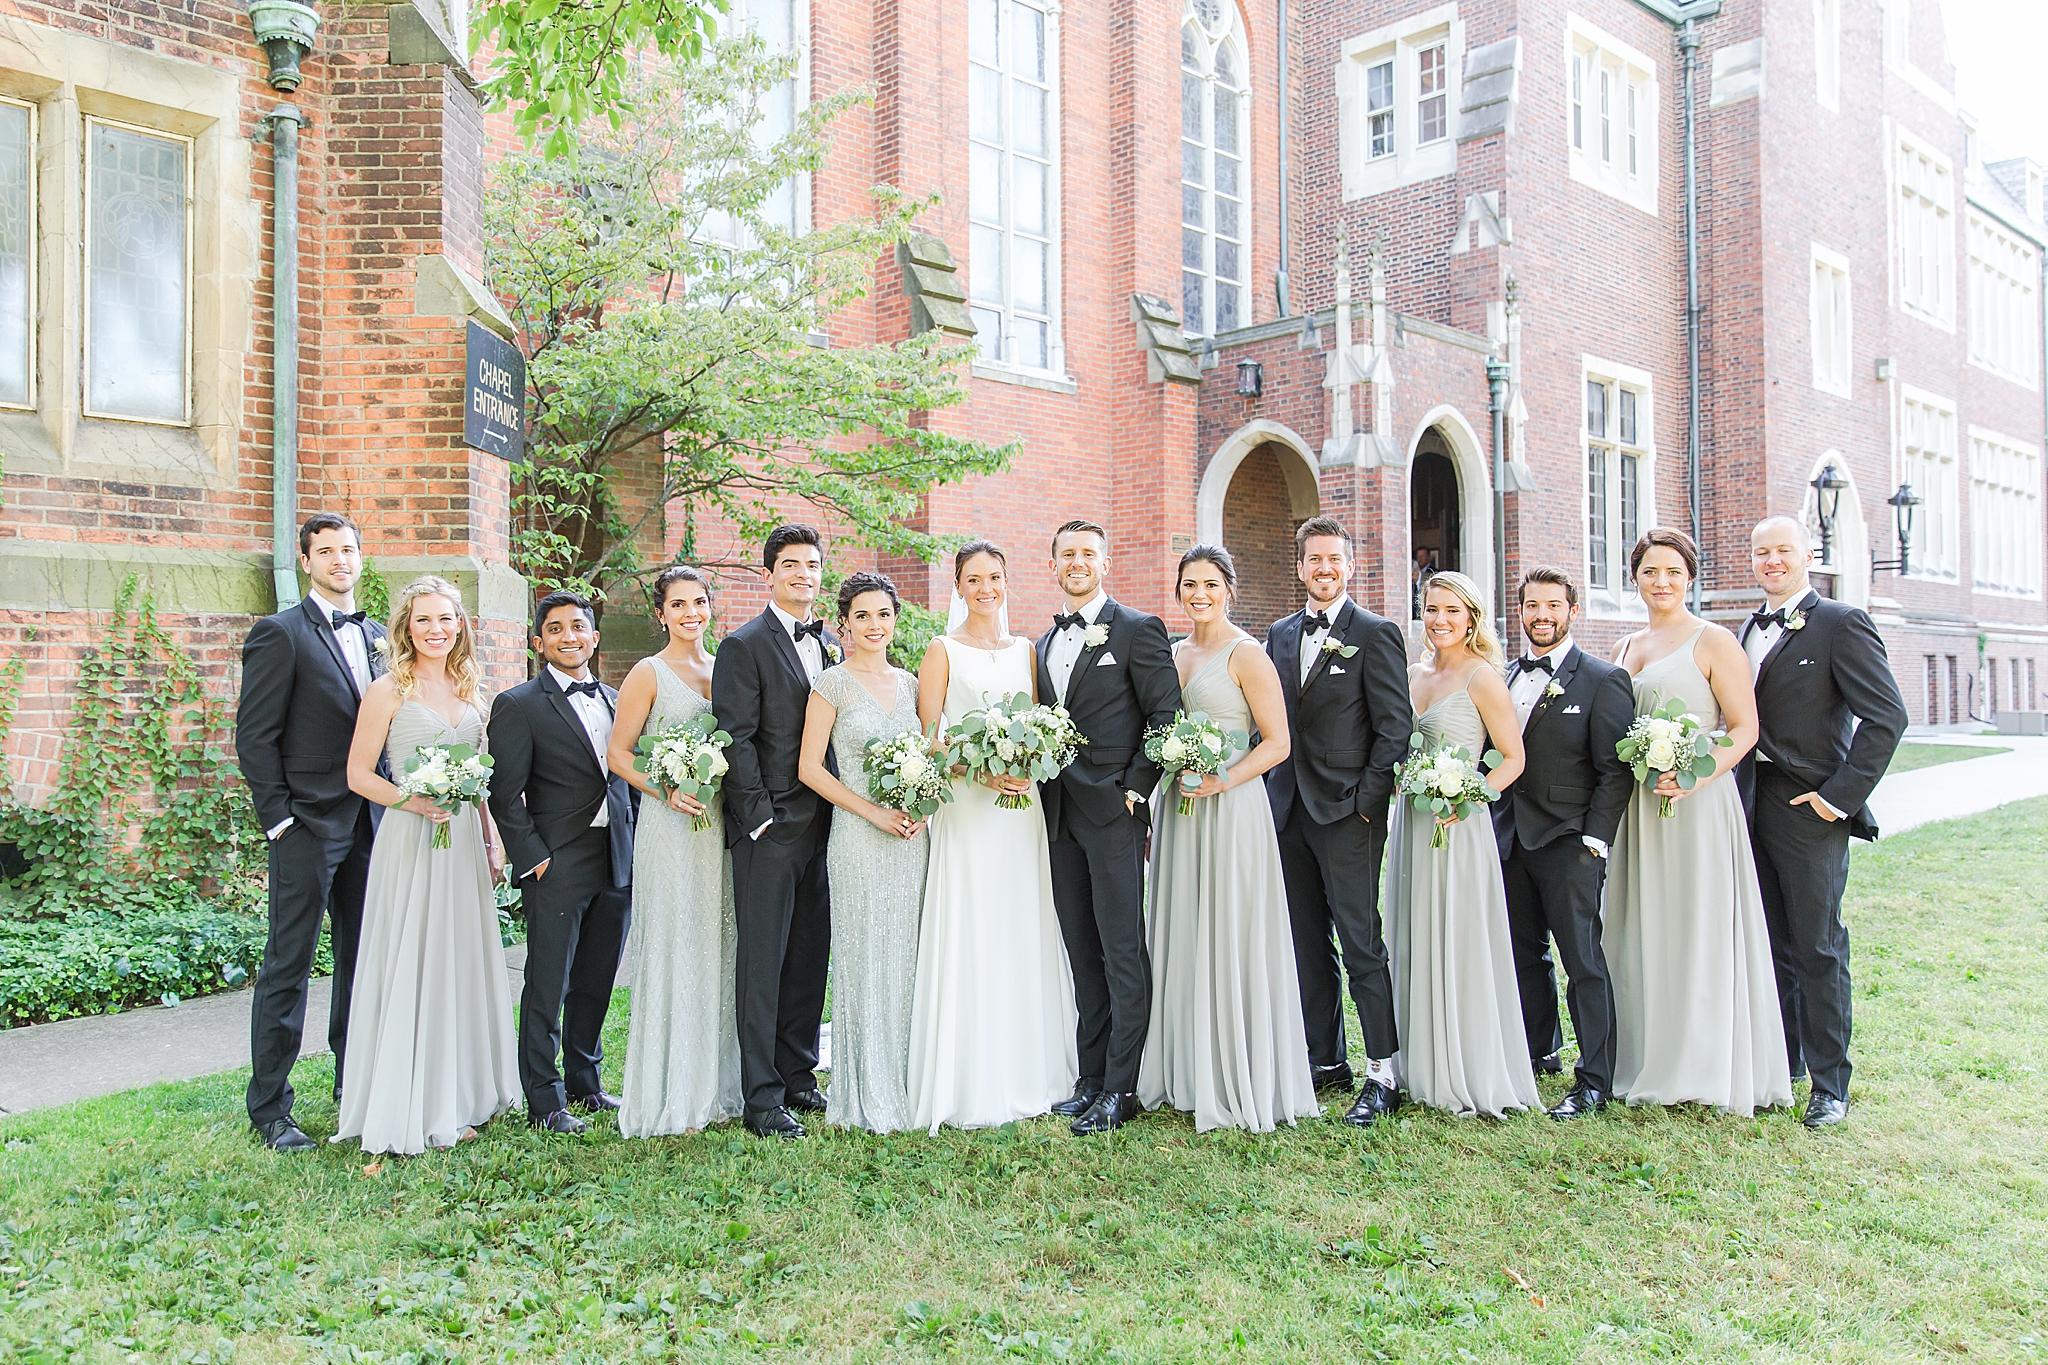 detroit-wedding-photographer-grosse-pointe-academy-chapel-detroit-golf-club-wedding-carly-matt-by-courtney-carolyn-photography_0078.jpg